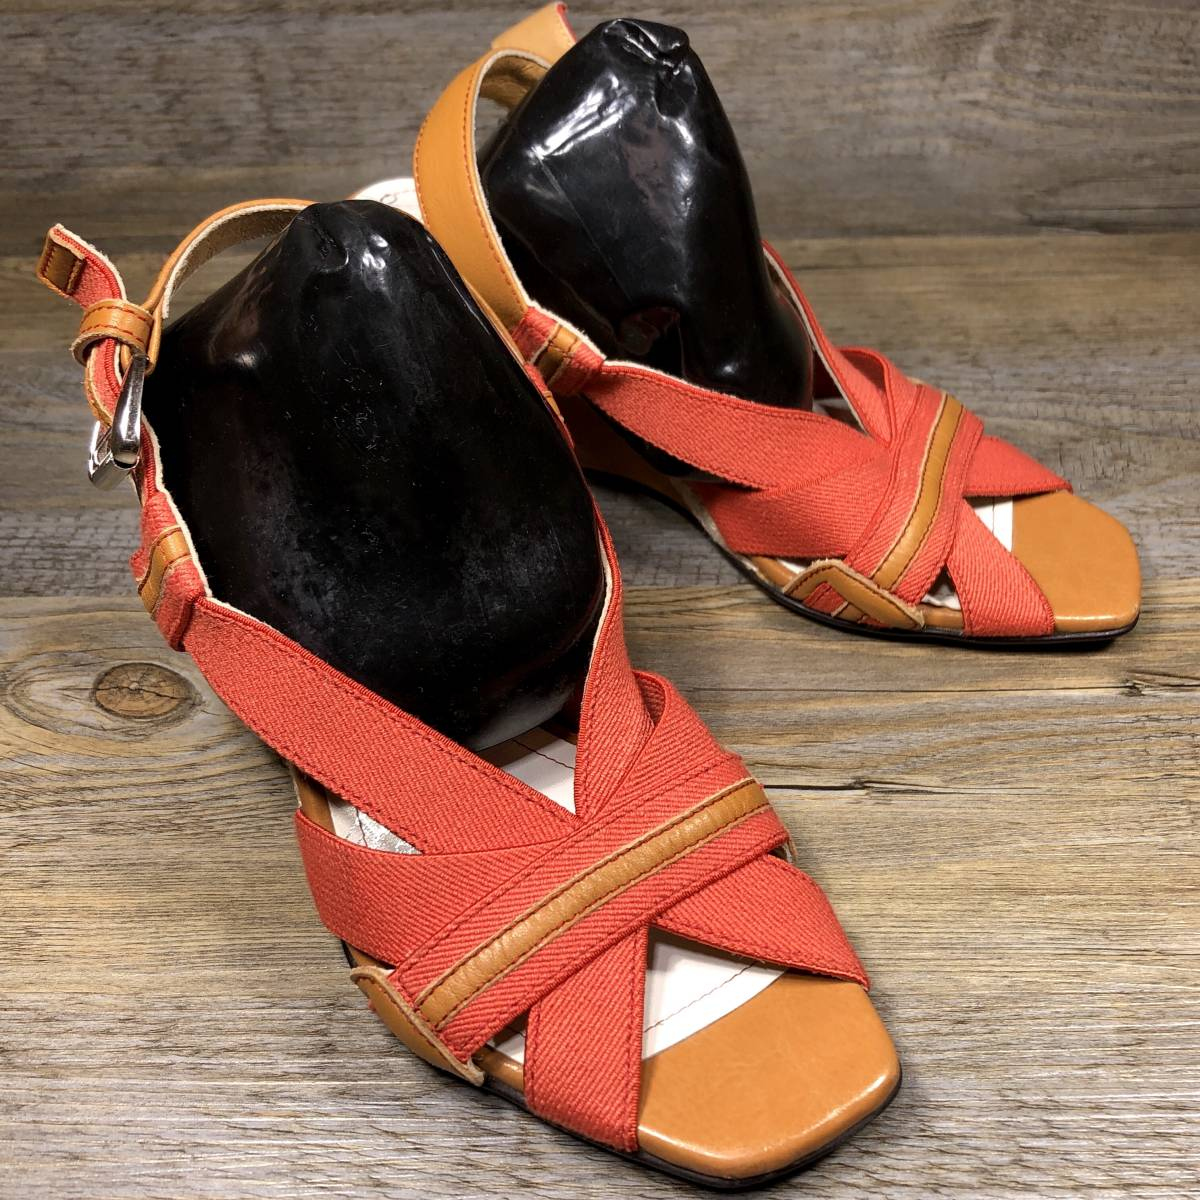 ■REGAL■ 23cm オレンジ リーガル サンダル レディース ウェッジソール 靴 くつ 中古 宅急便 即決_画像3